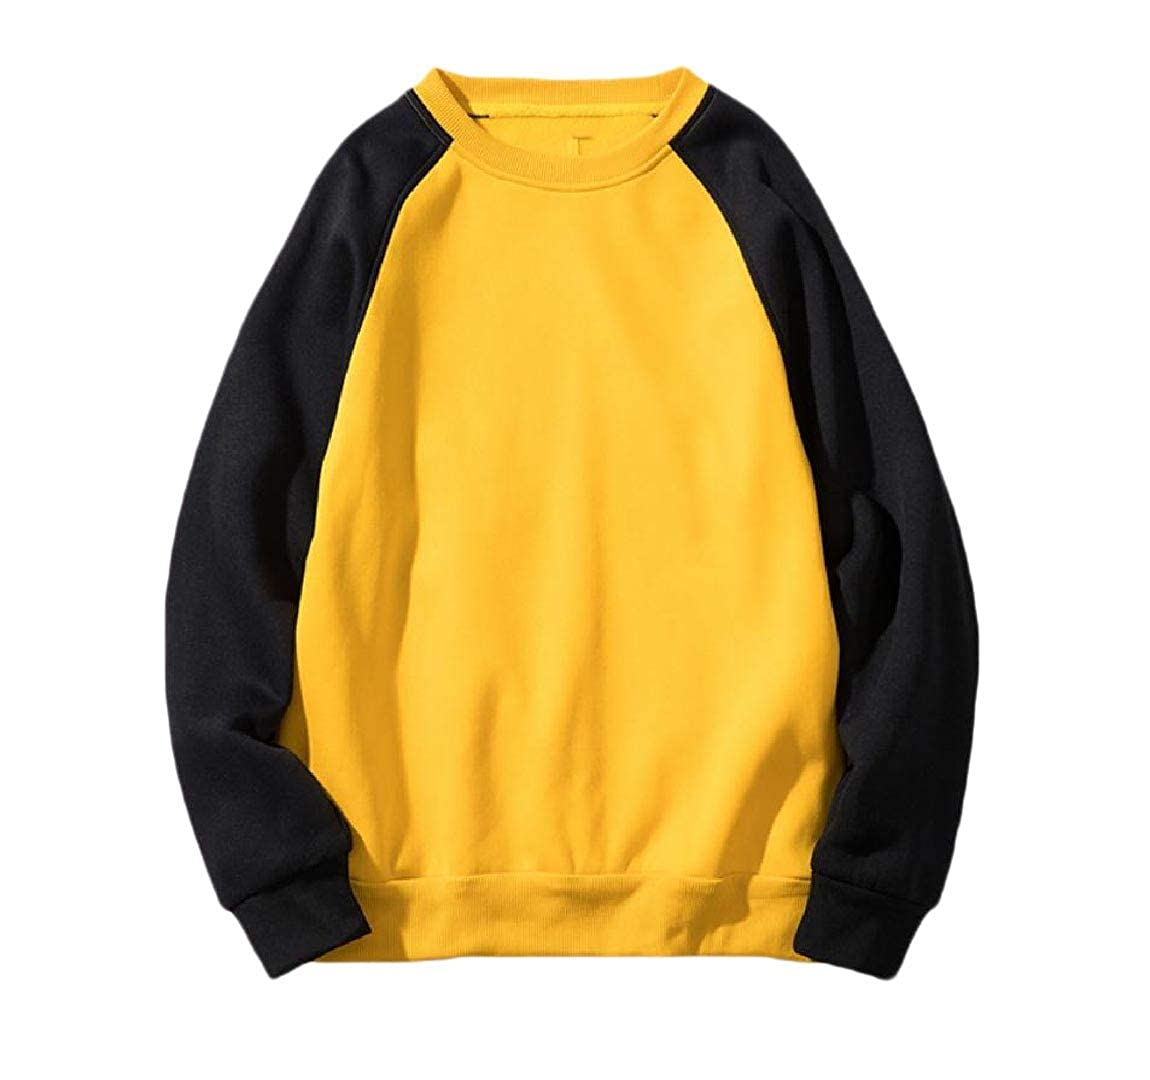 YUNY Mens Contrast Casual Raglan Sport Crew Neck Jacket Sweatshirts Yellow XL